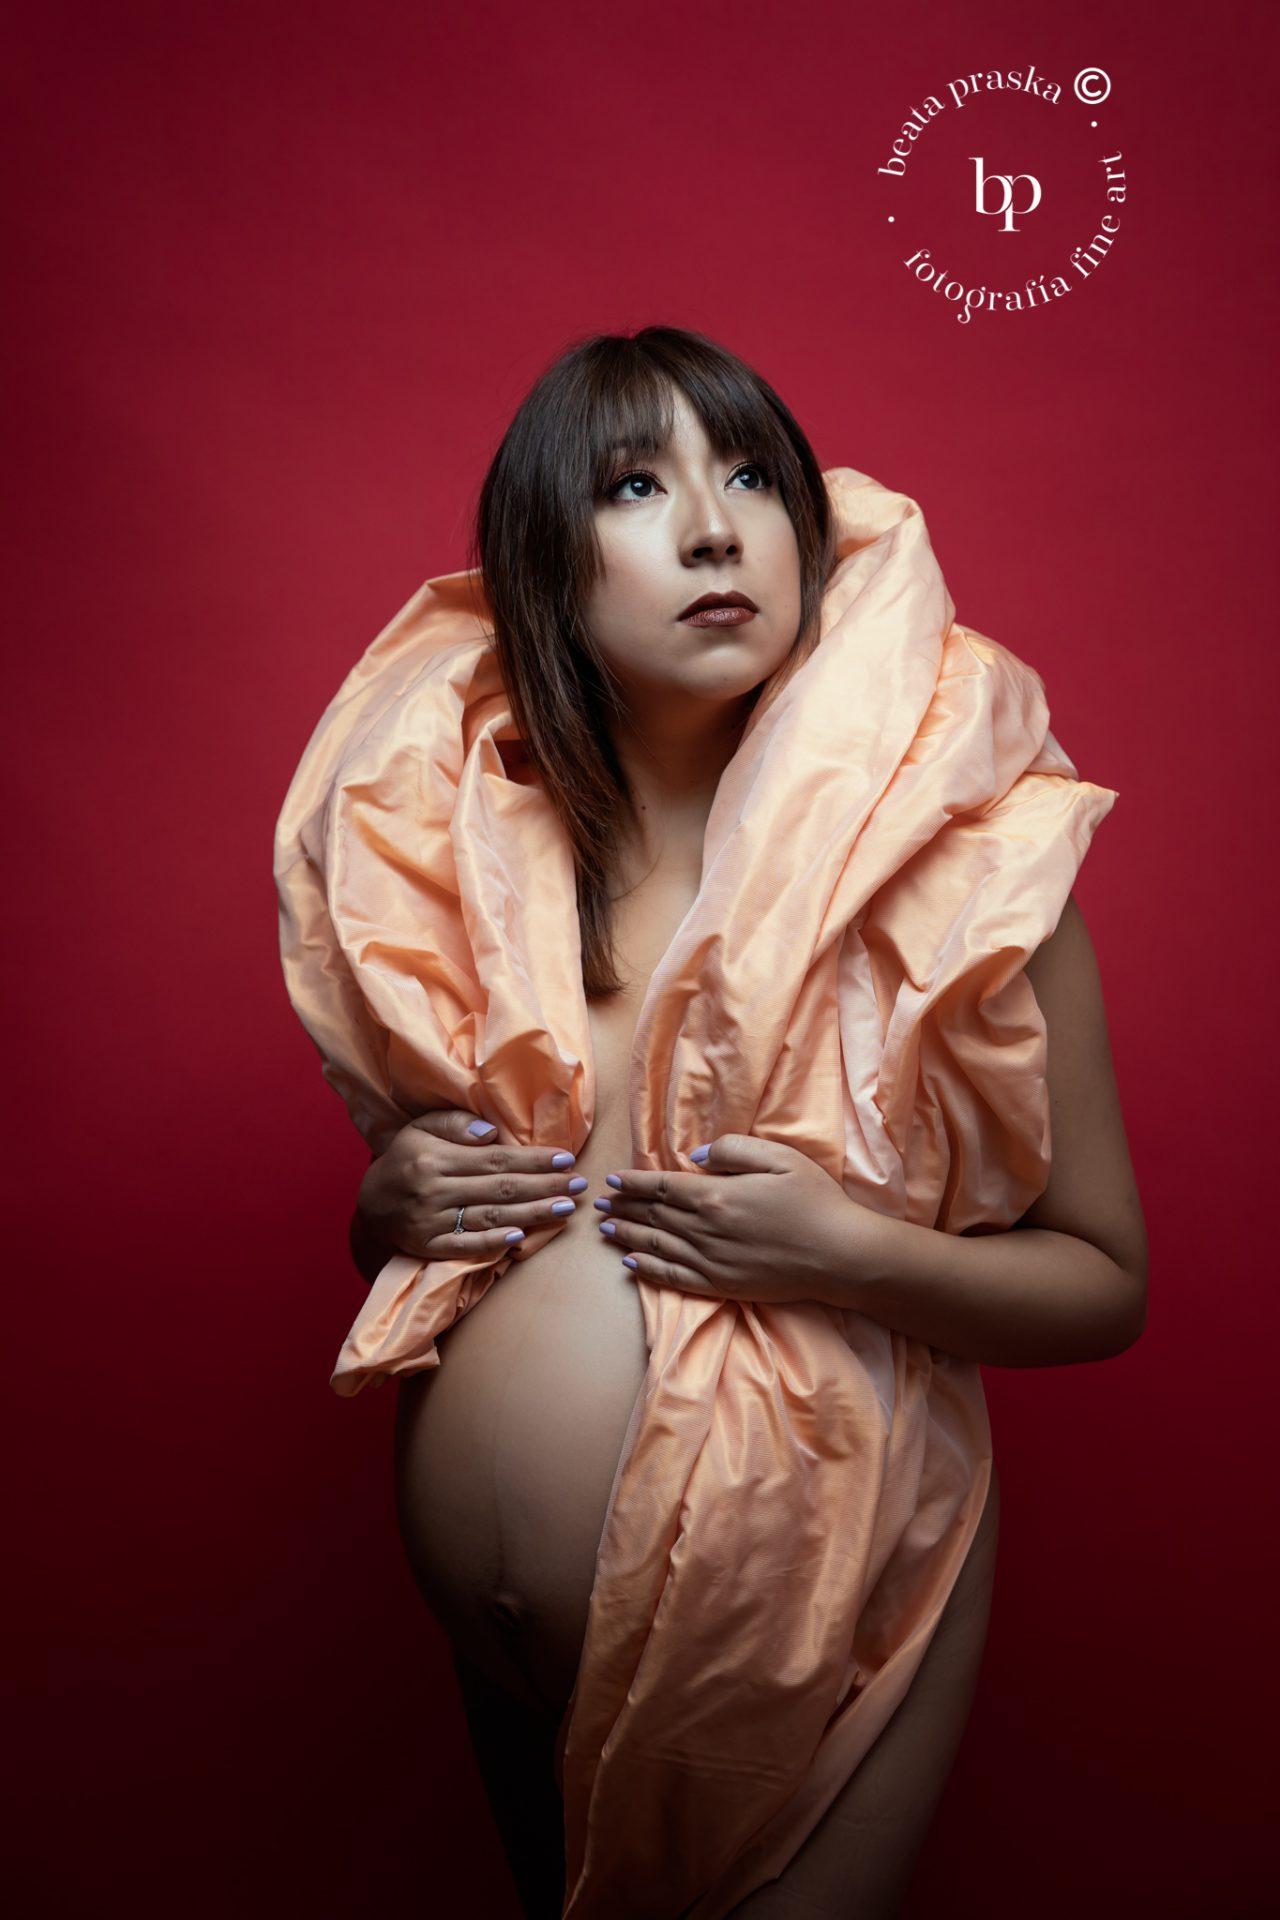 fotografia de embarazo elegante